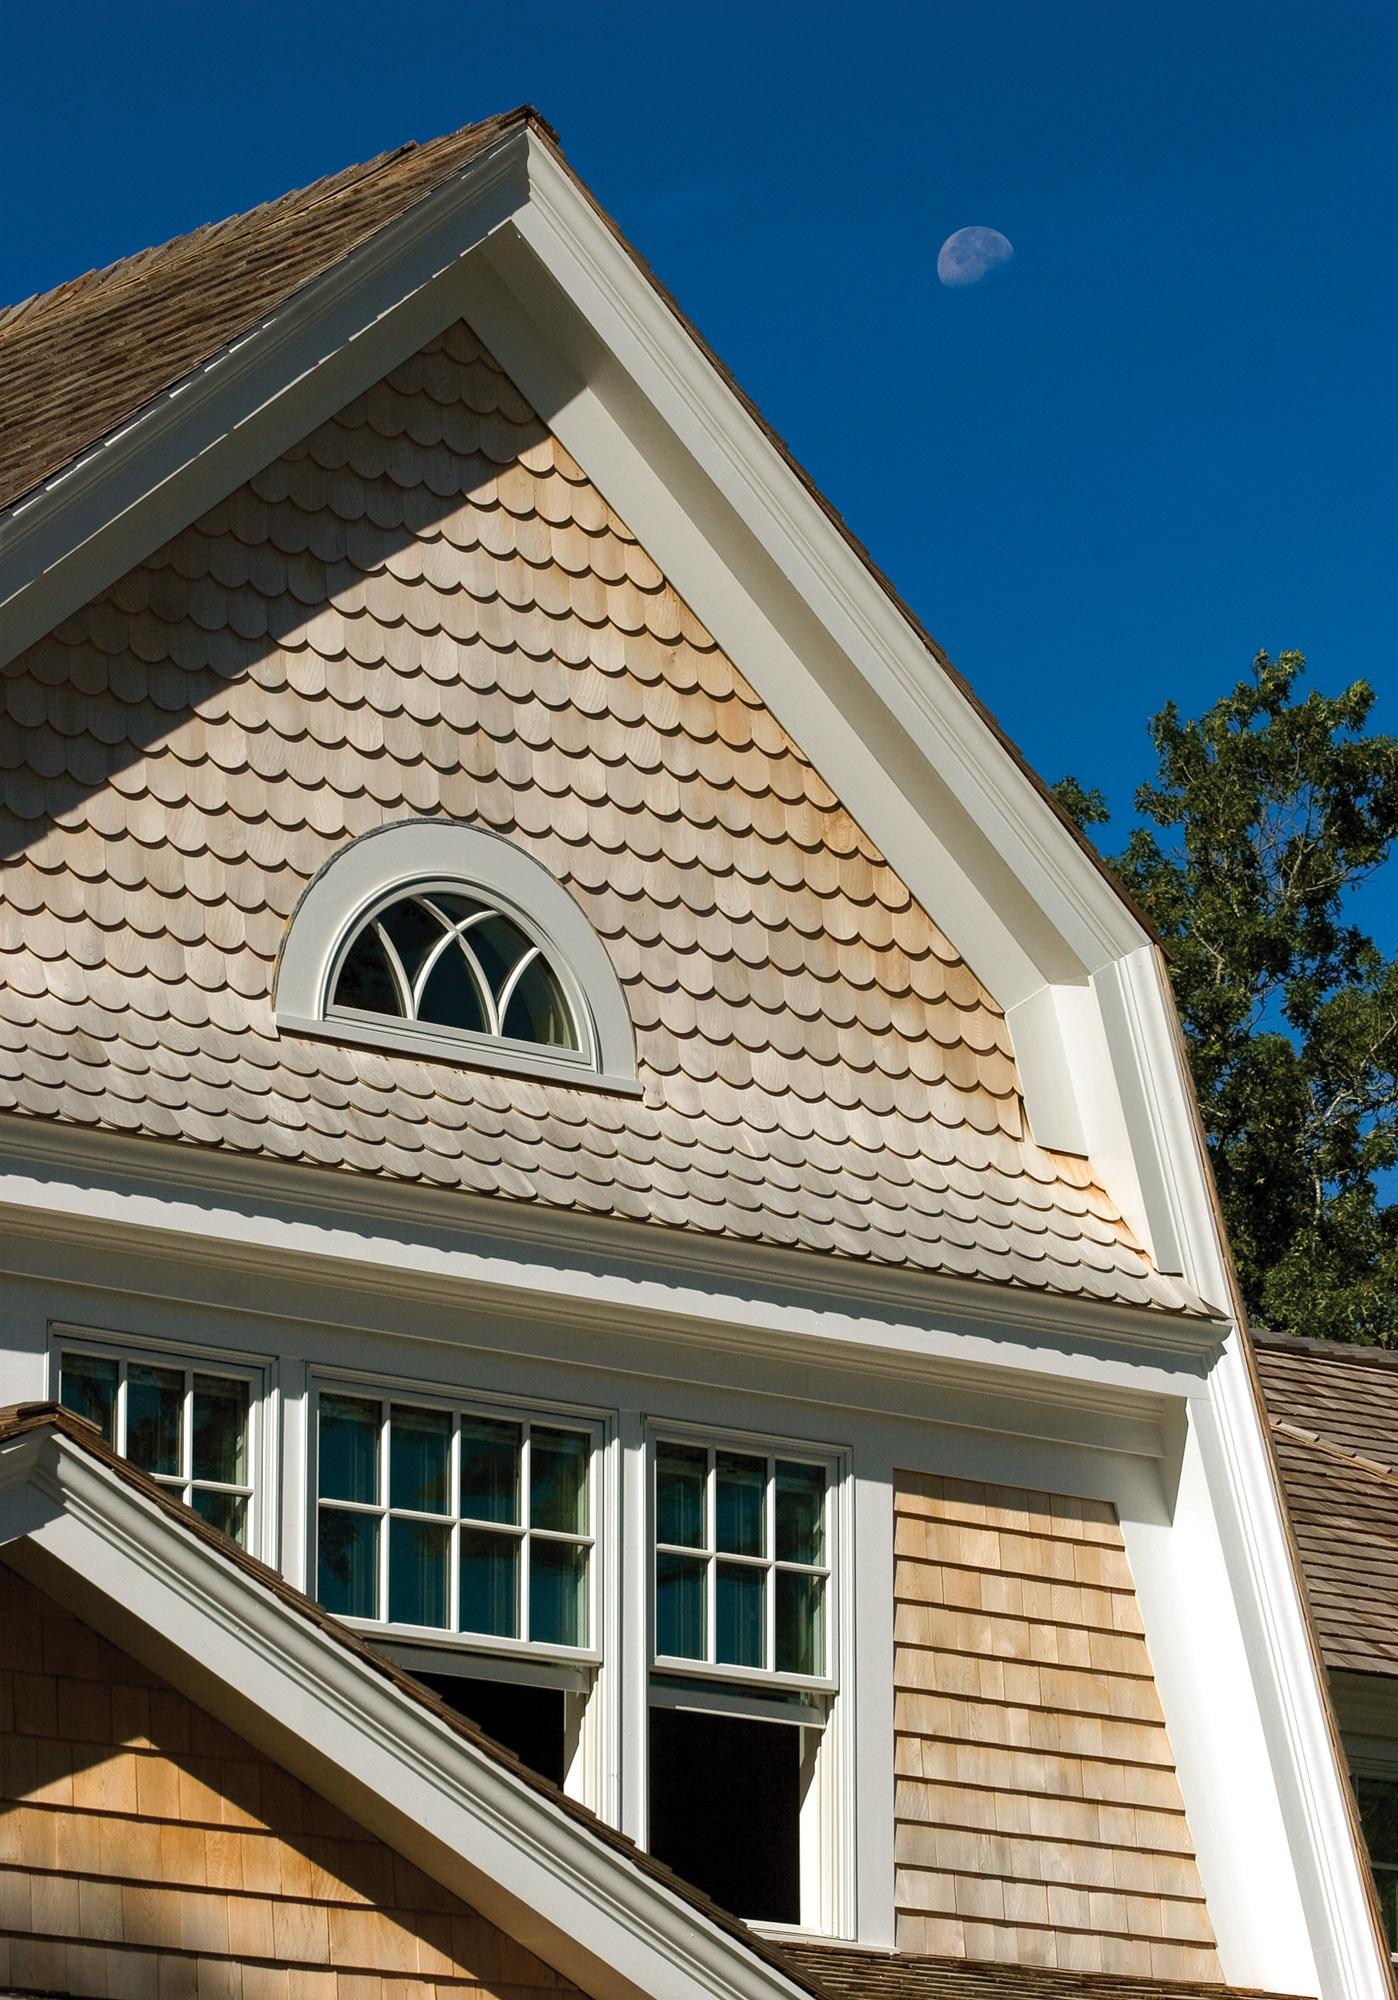 Square and fancy-butt white-cedar shingles